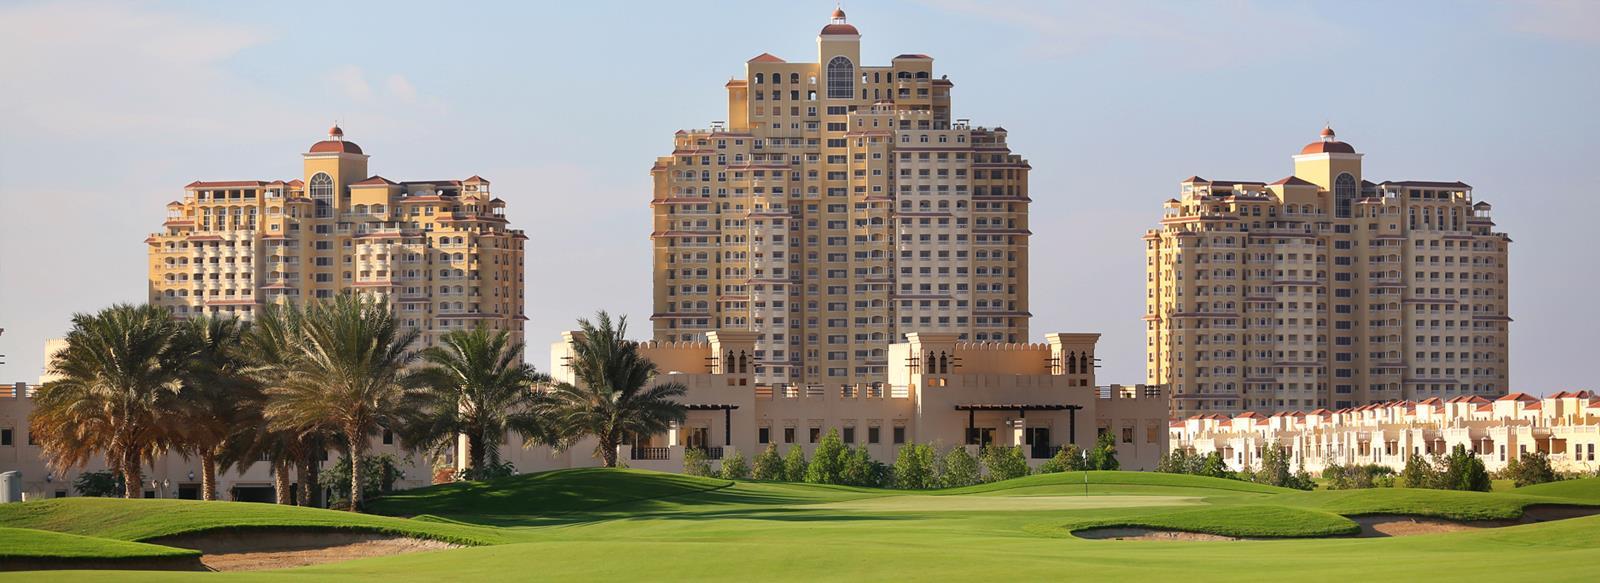 Royal Breeze Residence in Ras Al Khaimah